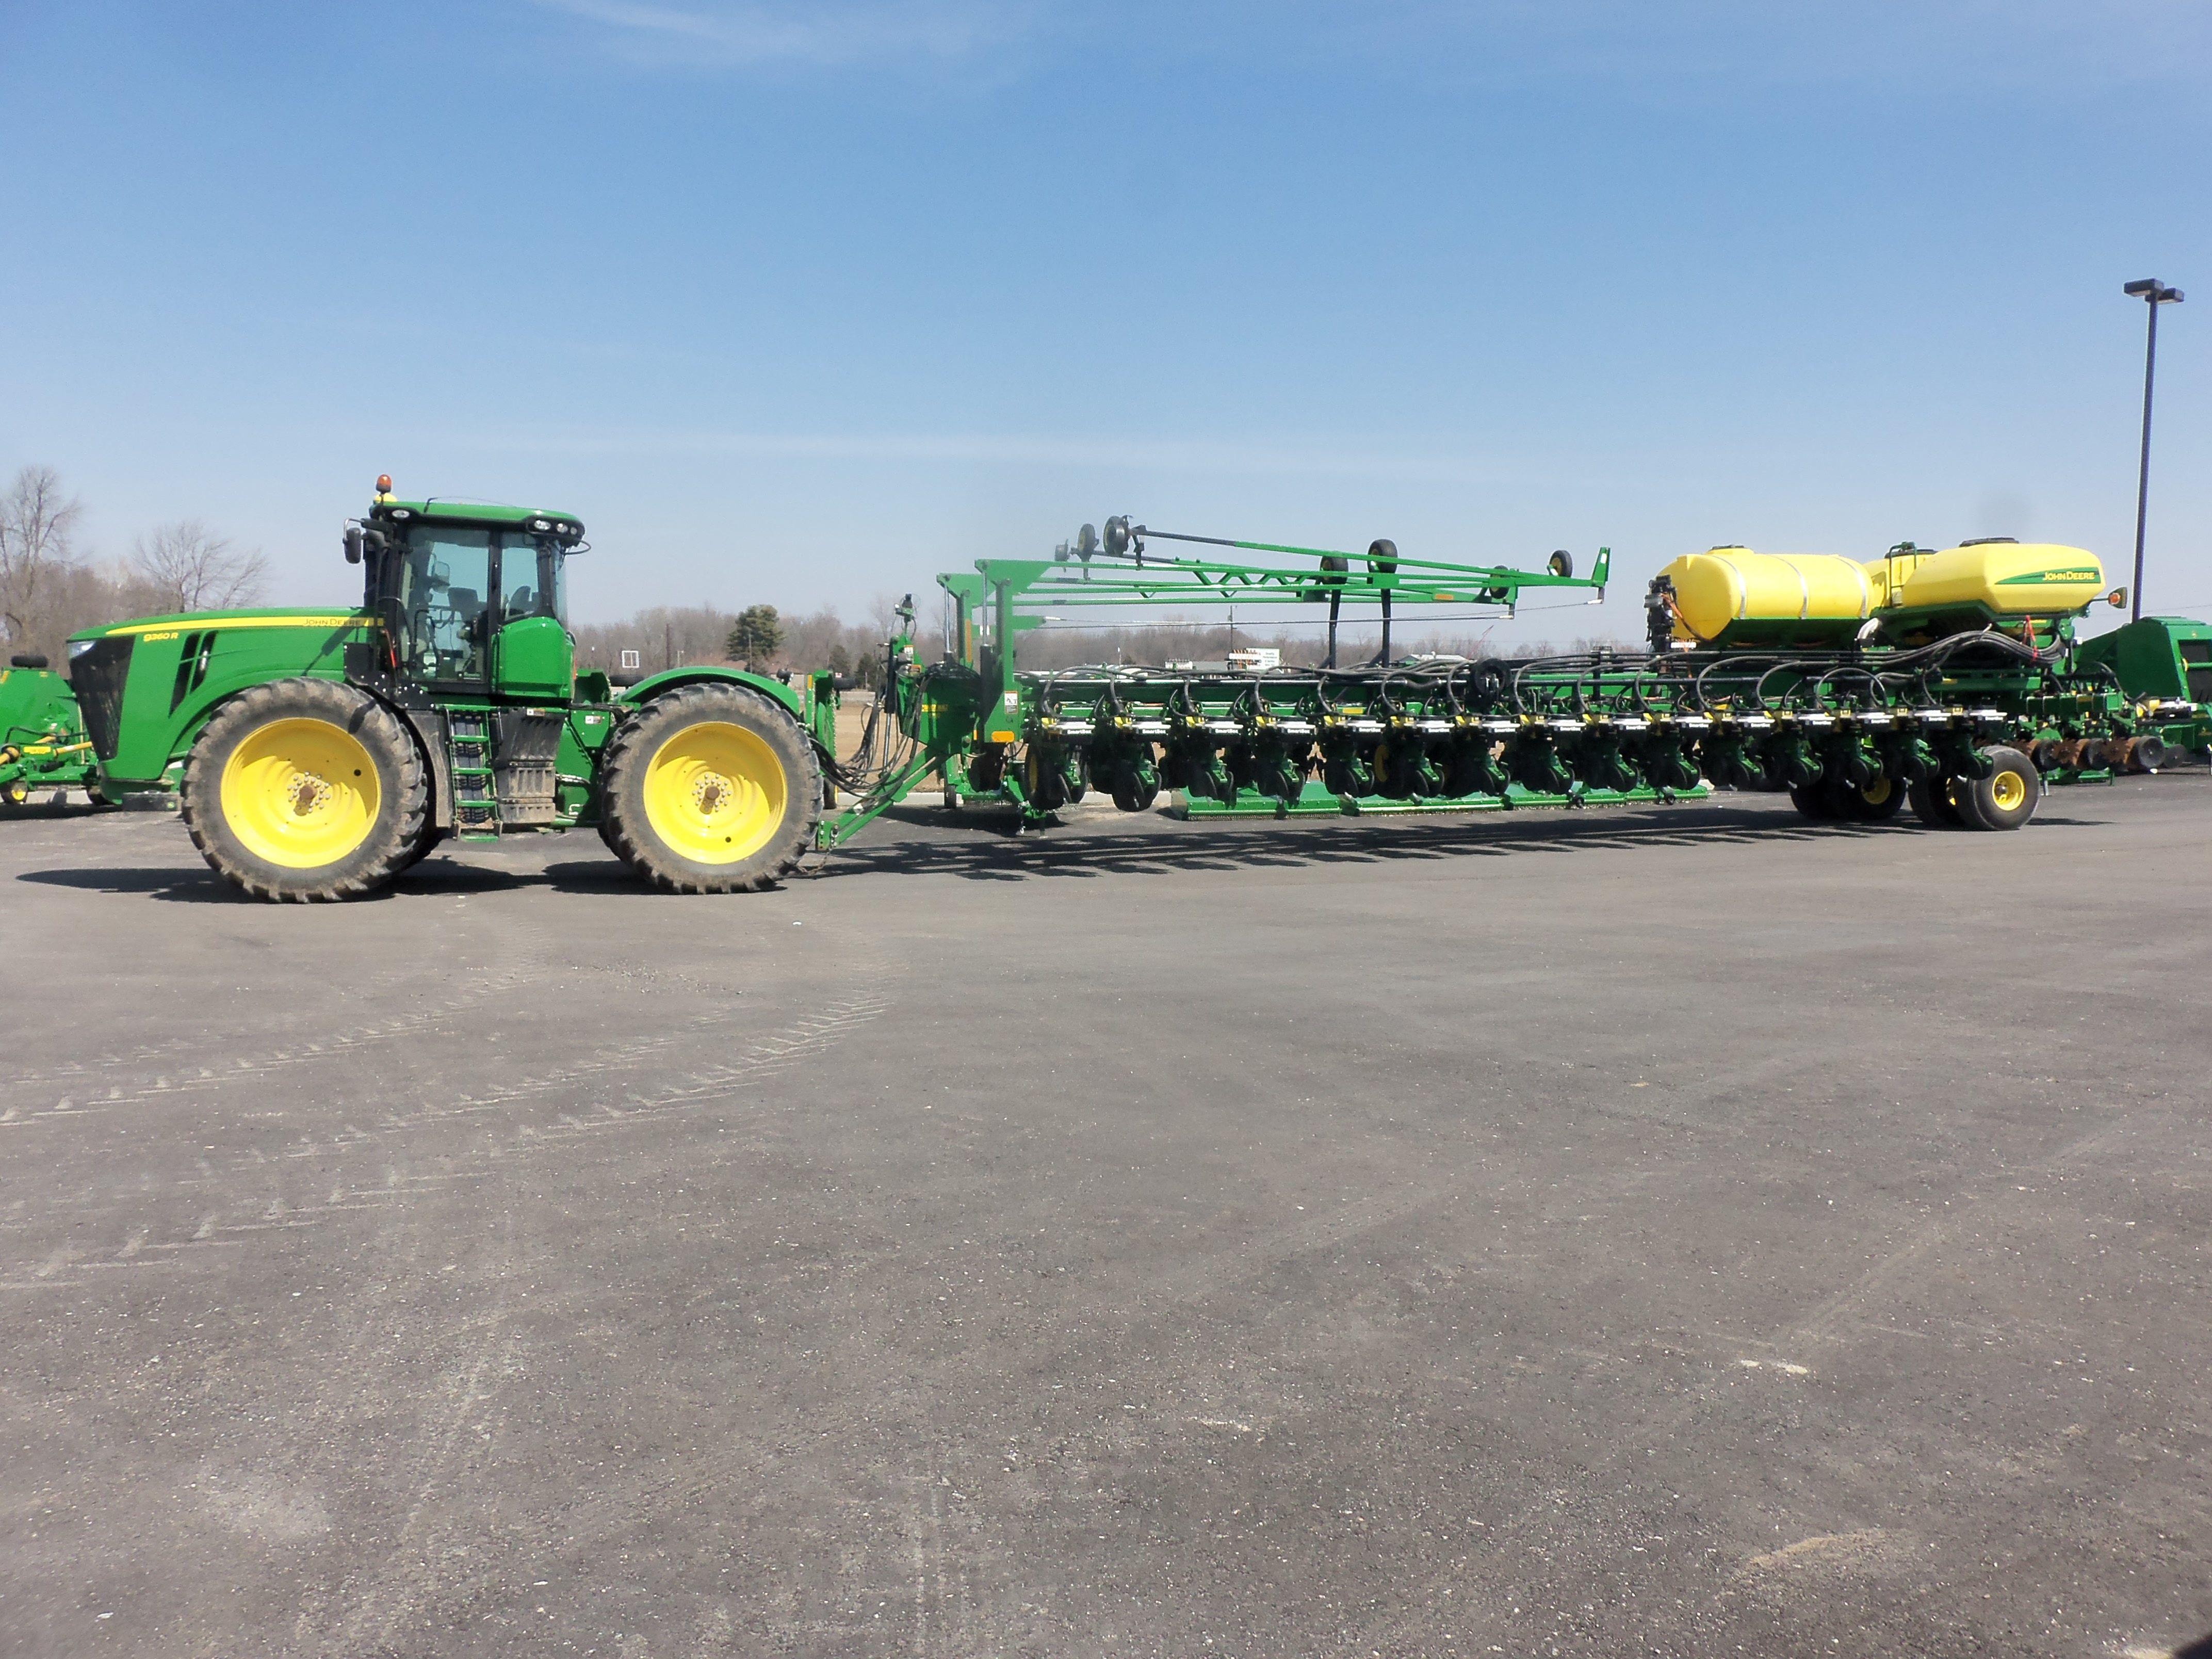 360hp John Deere 9360r Hooked To 36 Row Db90 Corn Planter John